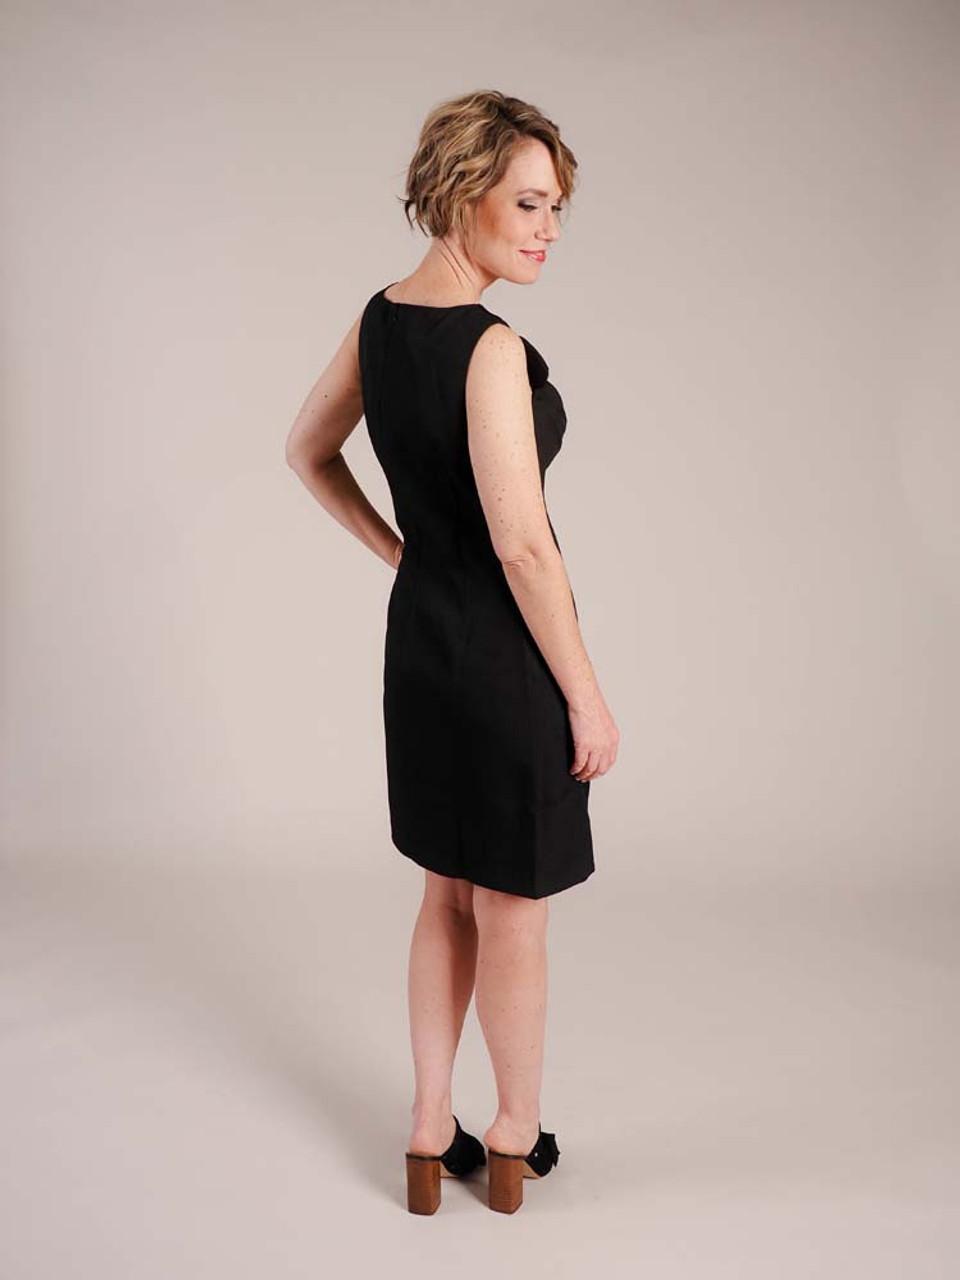 Angelica Black Dress